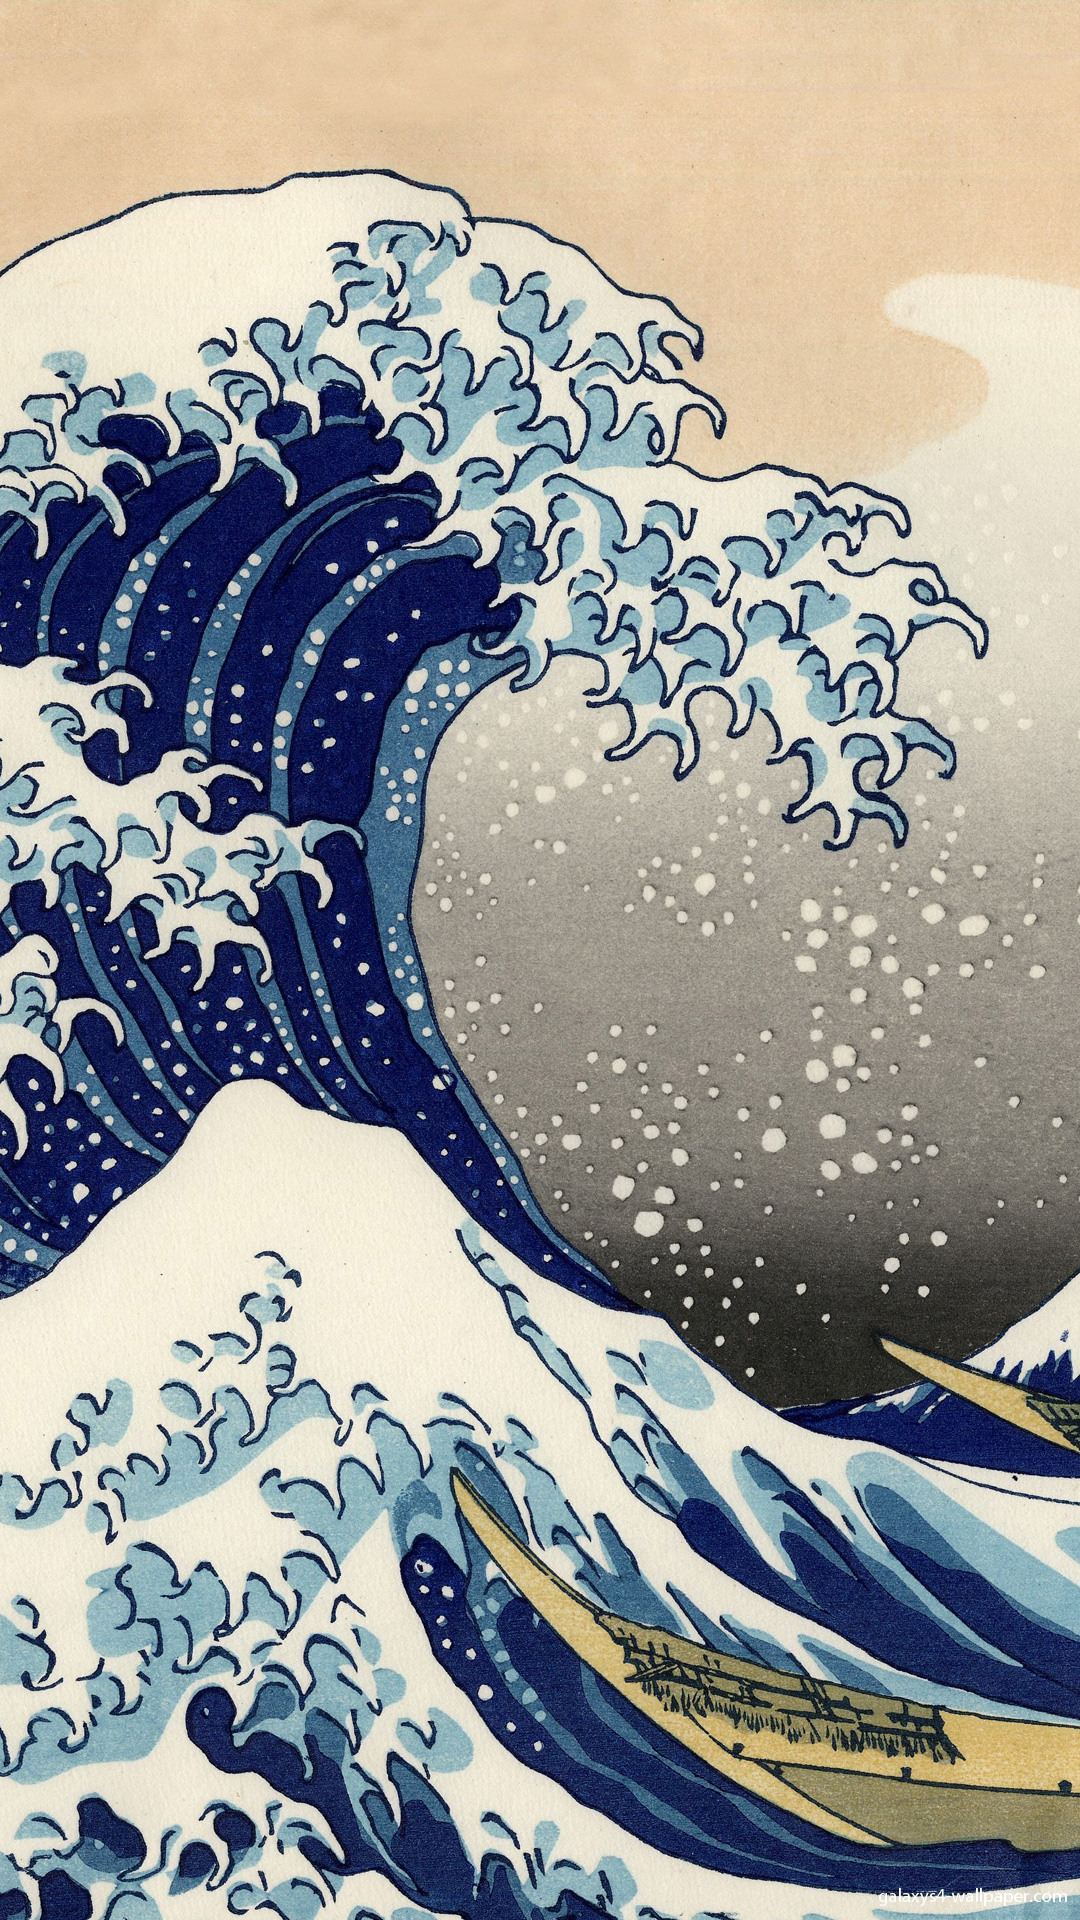 Hokusai Katsushika Wallpaper 01 Pictures 1080x1920